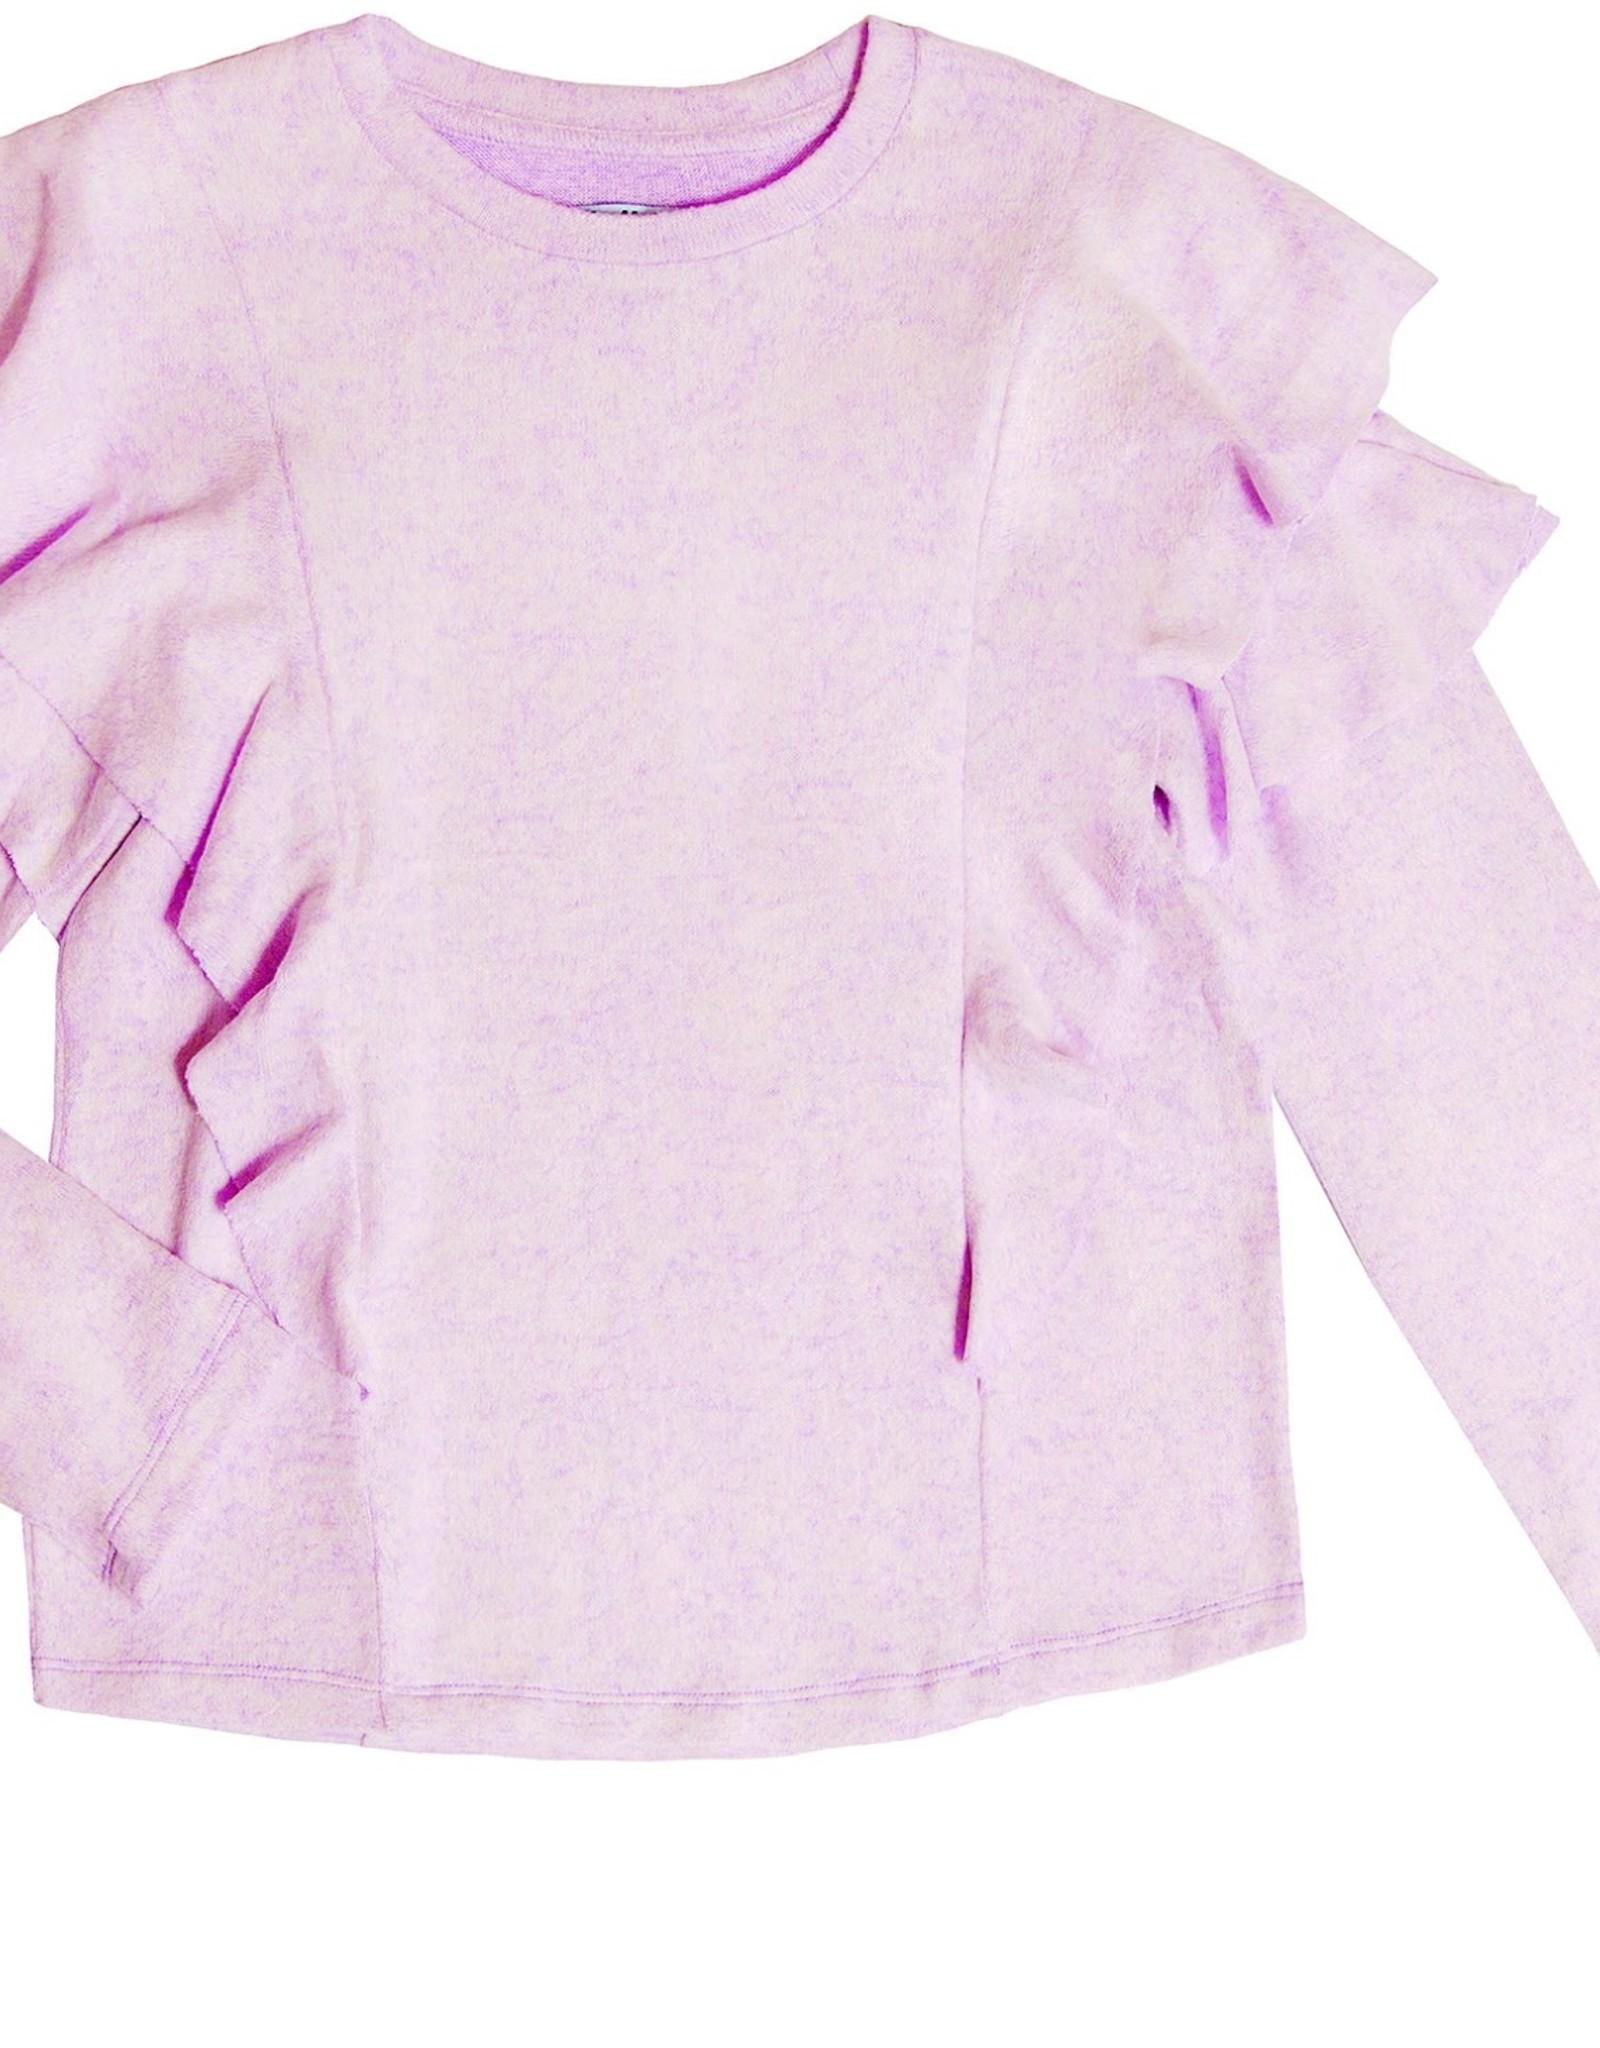 MIA NEW YORK MIA NEW YORK Double Ruffle Sweater